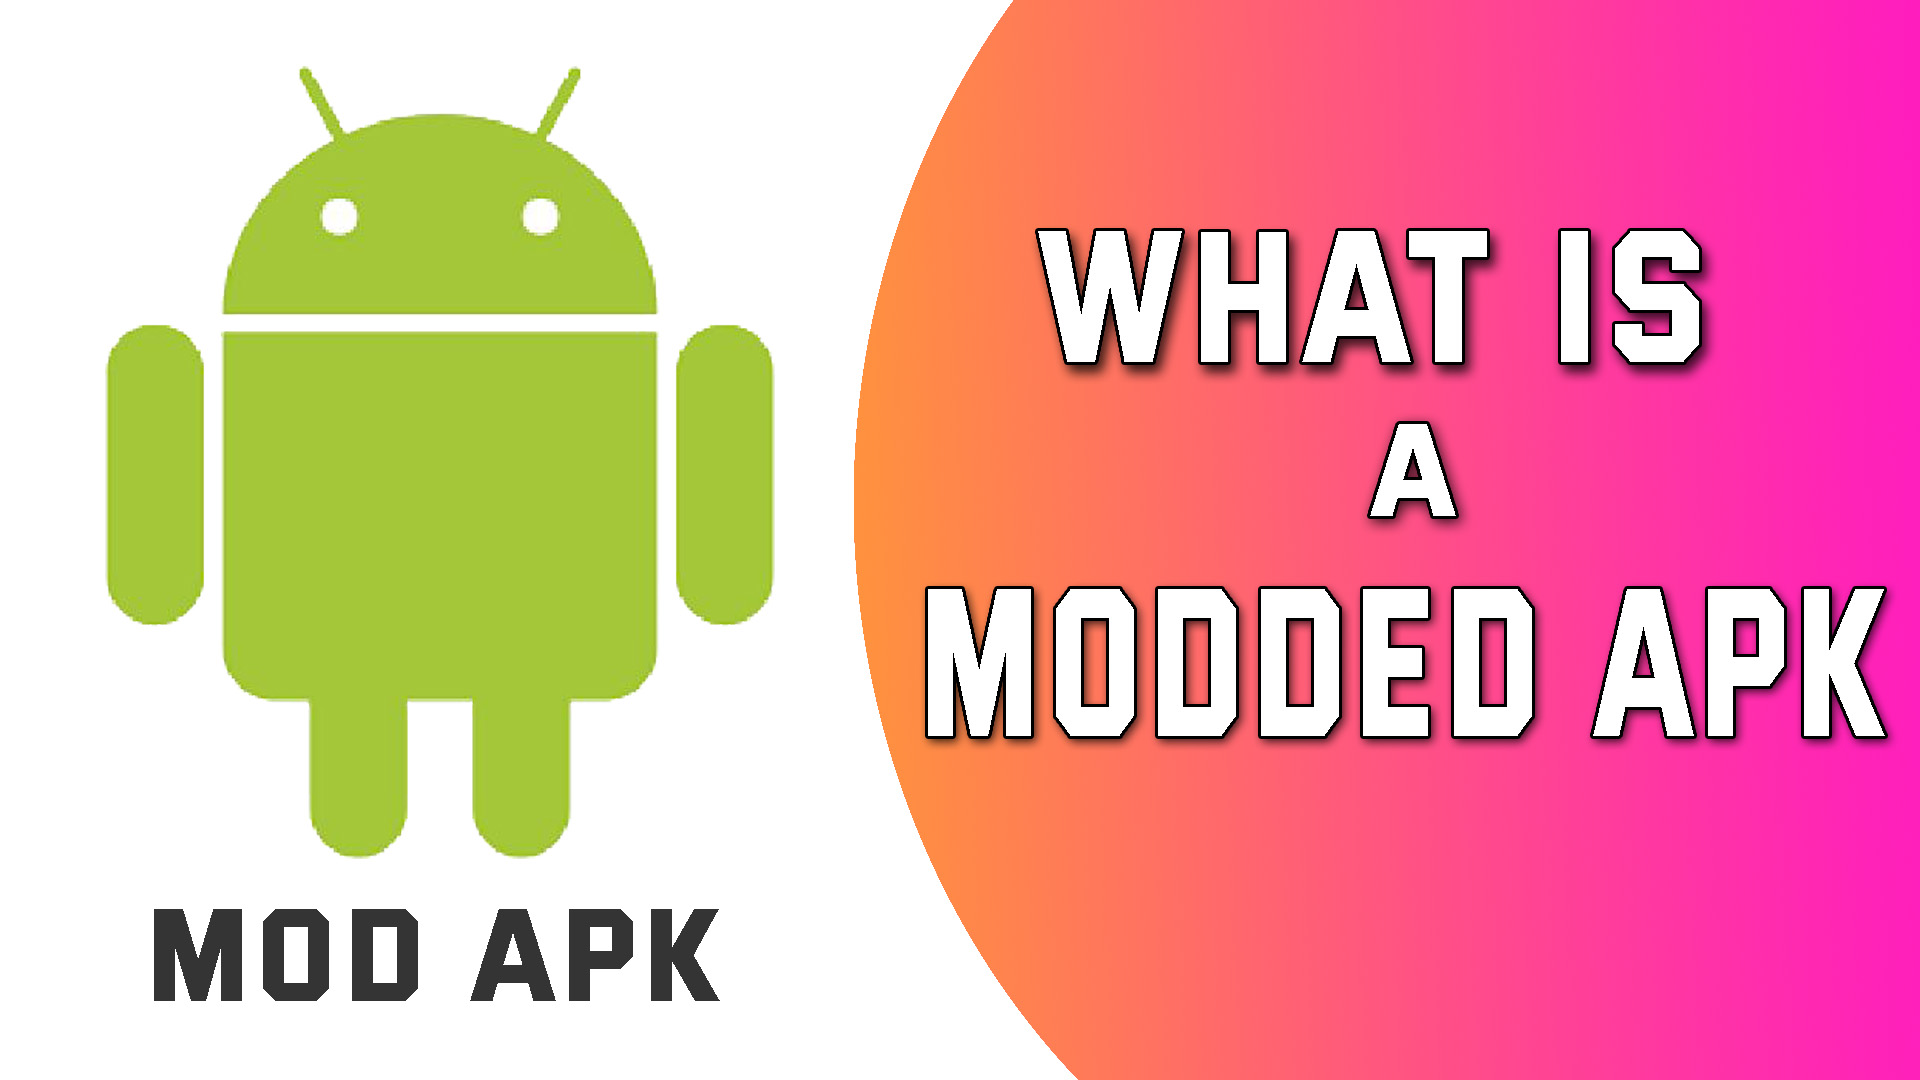 what is a modded apk / mod apk